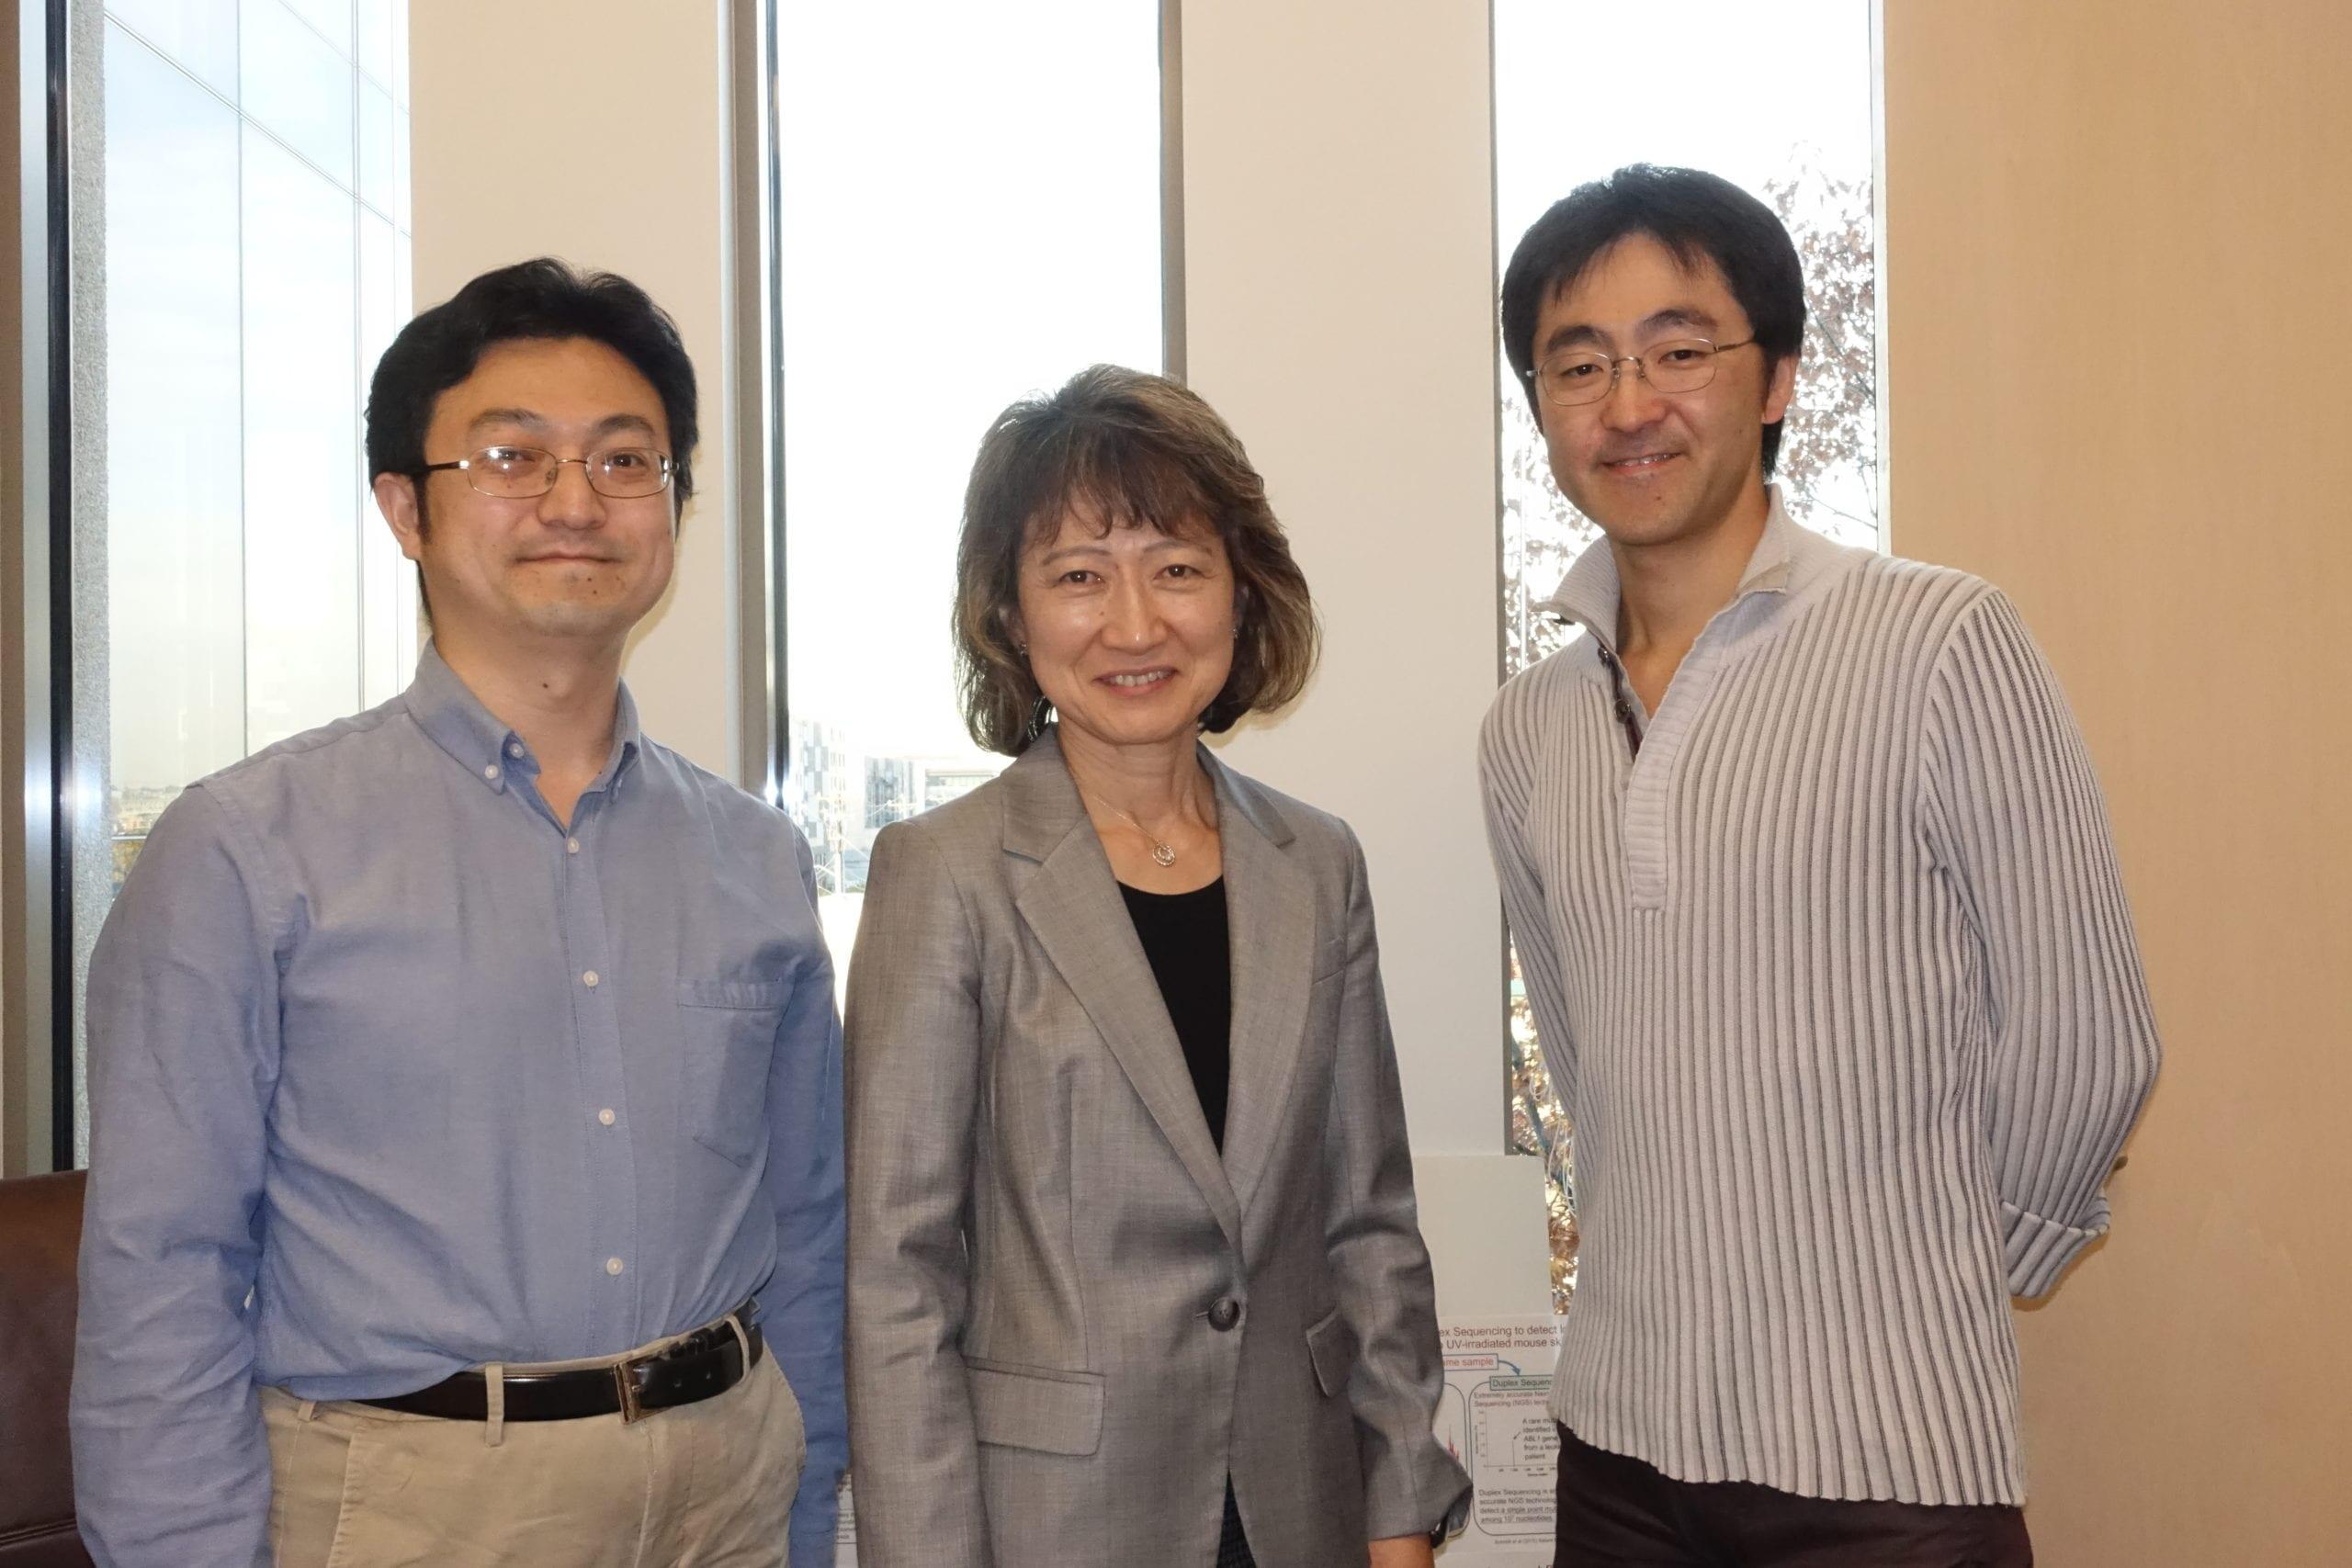 Mayumi Fujita, MD, PhD (Professor Of Dermatology, University Of Colorado)